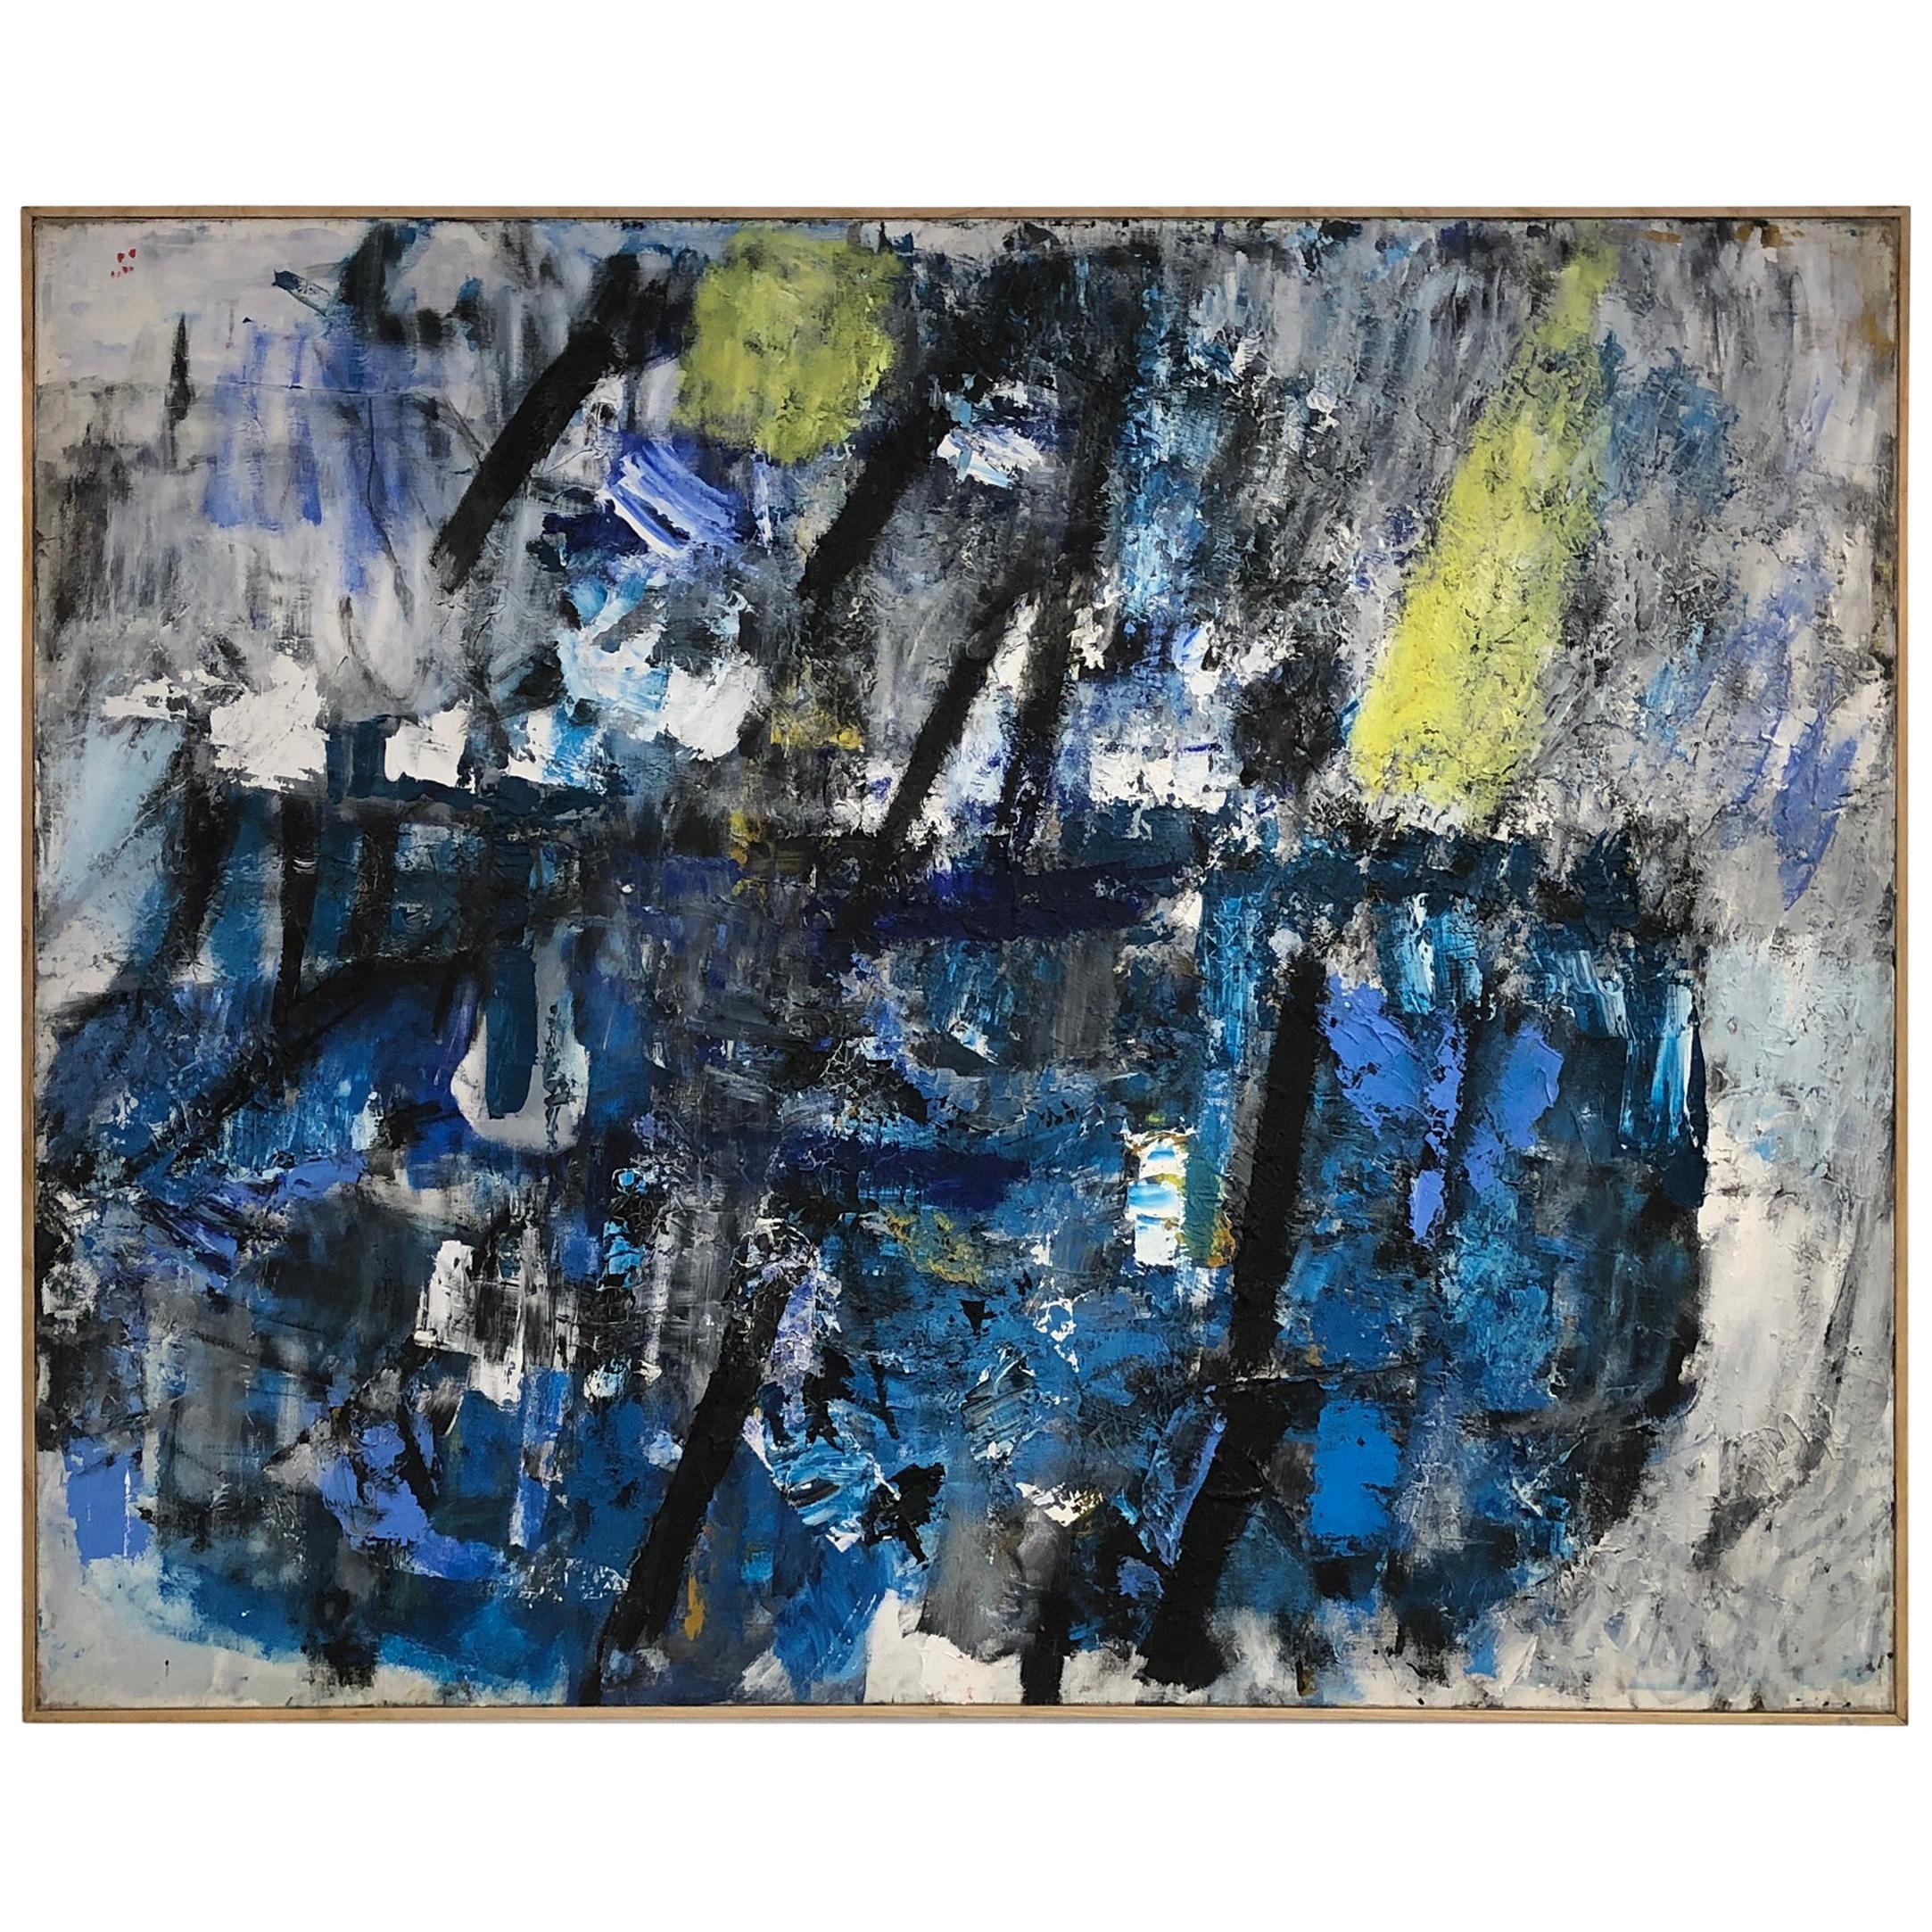 Abstract Painting by Nicolas Nicolov